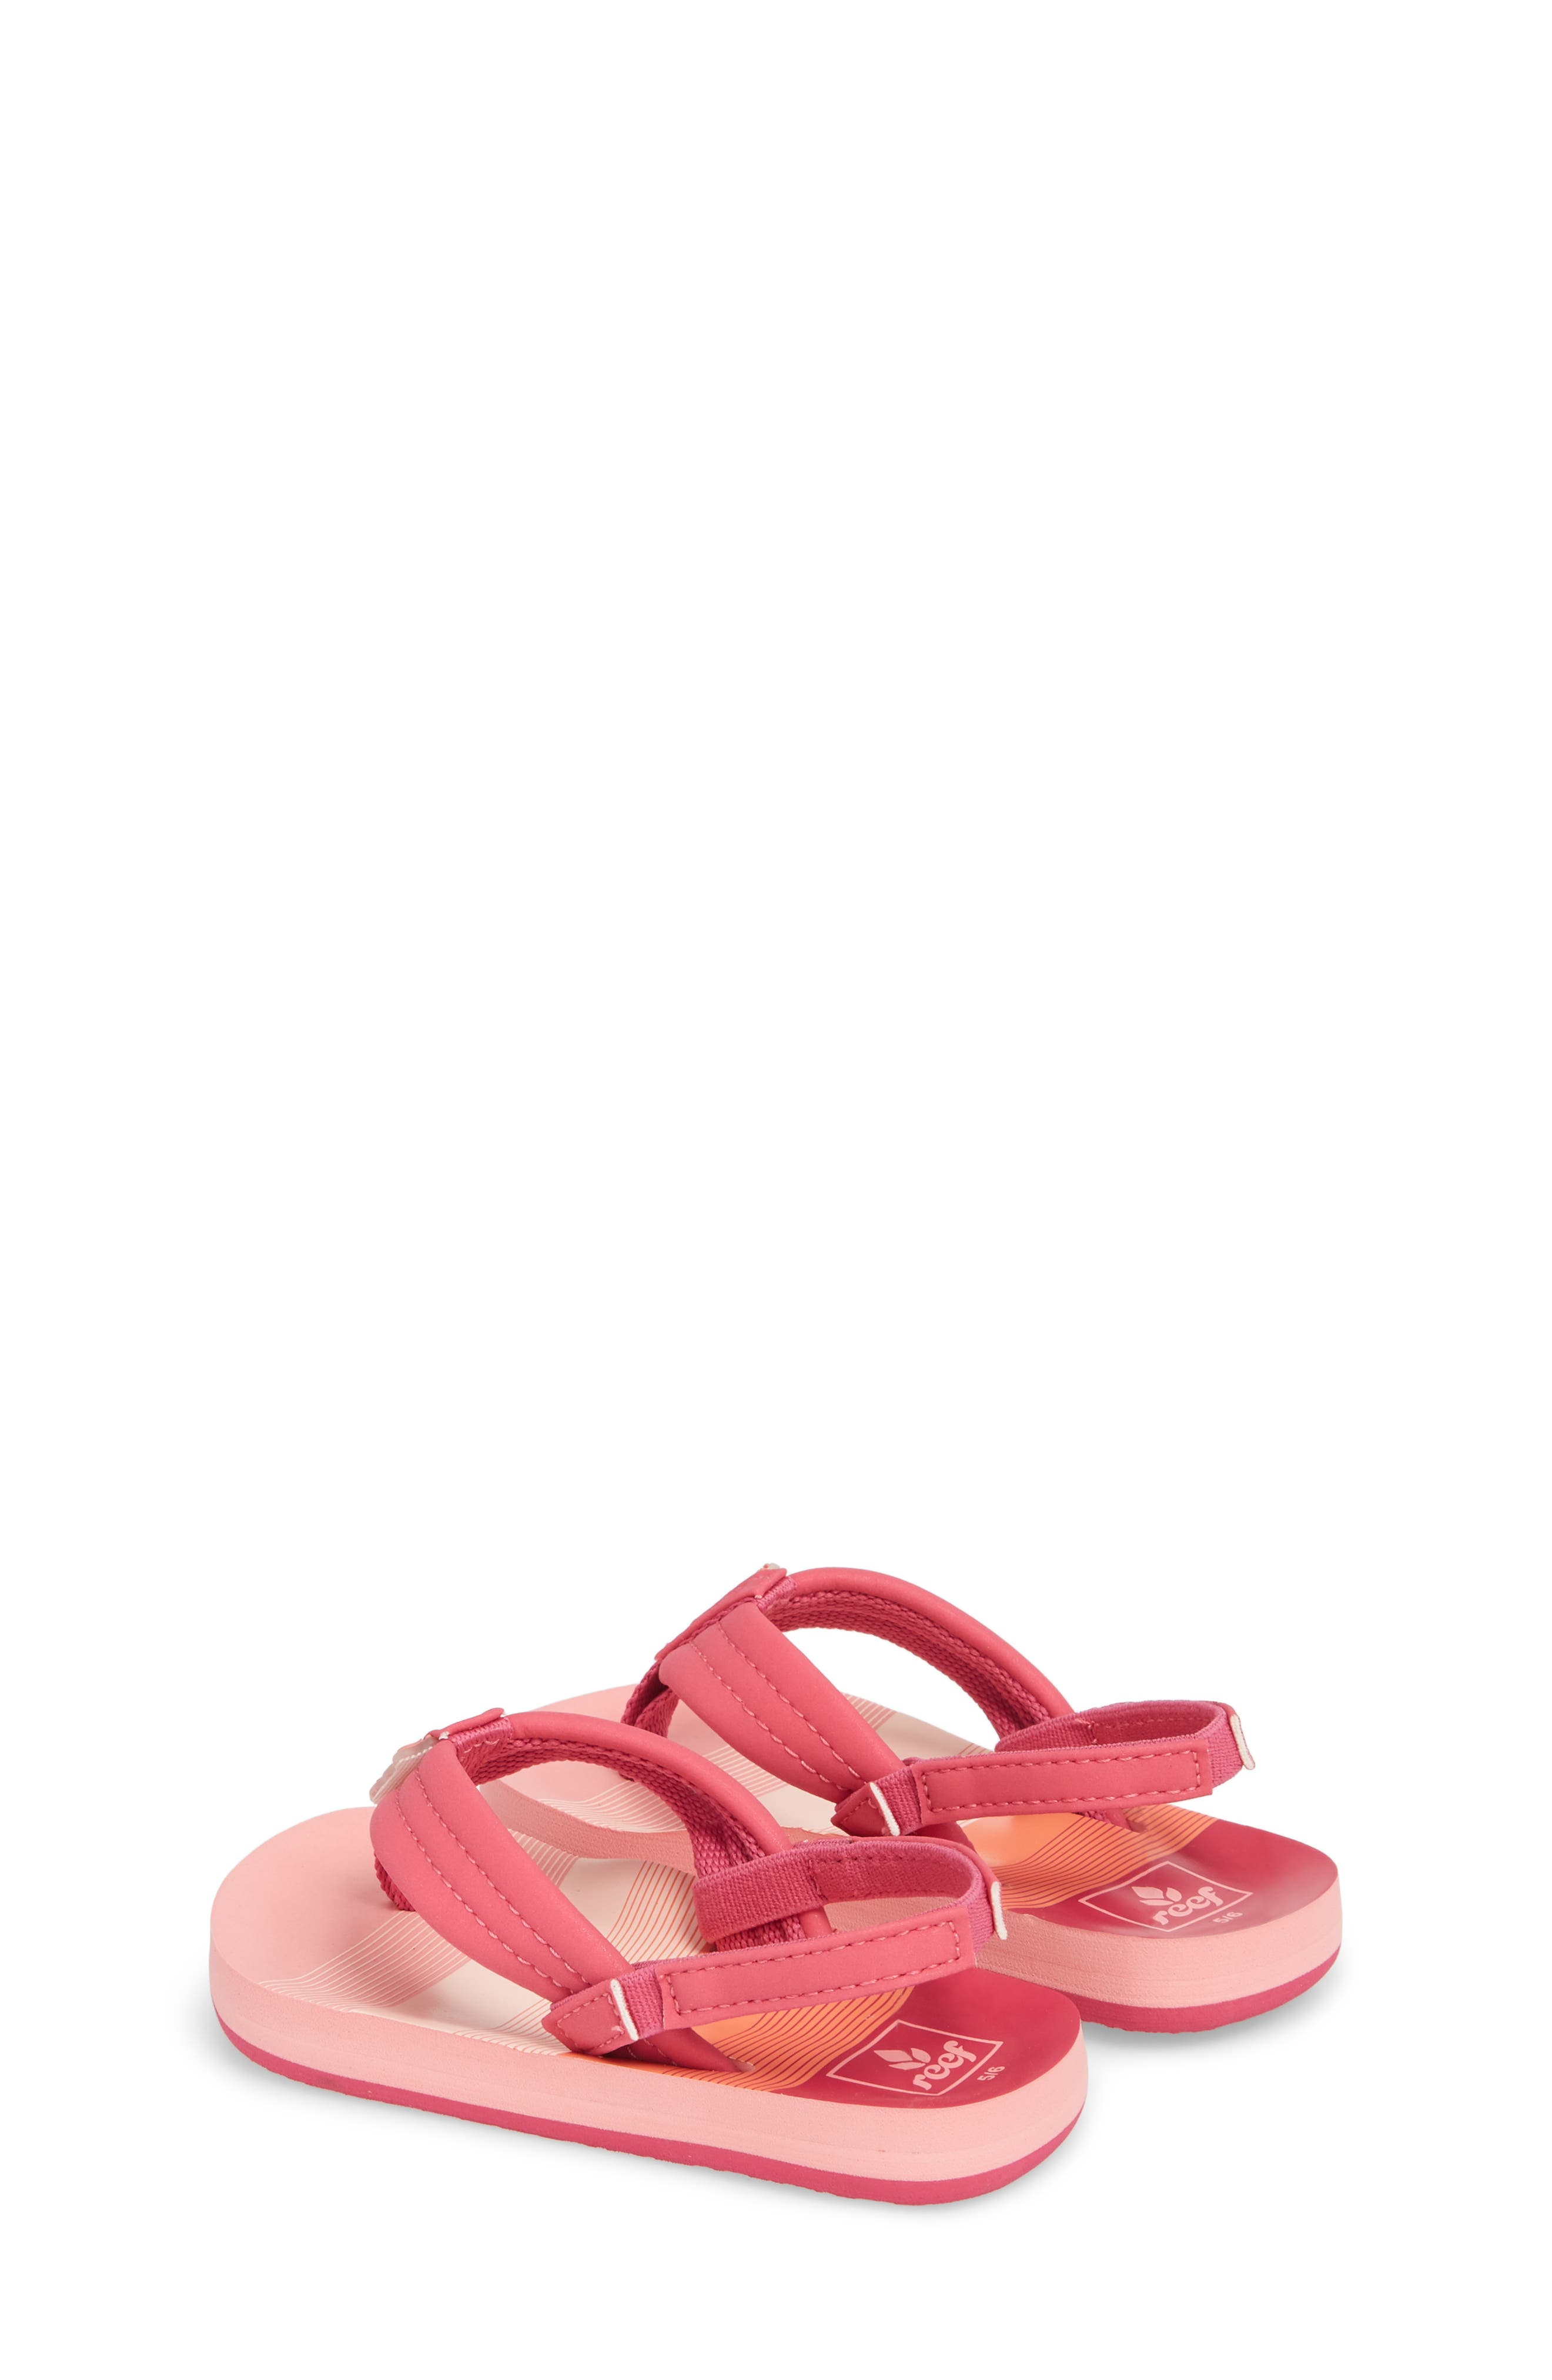 'Little Ahi' Thong Sandal,                             Alternate thumbnail 25, color,